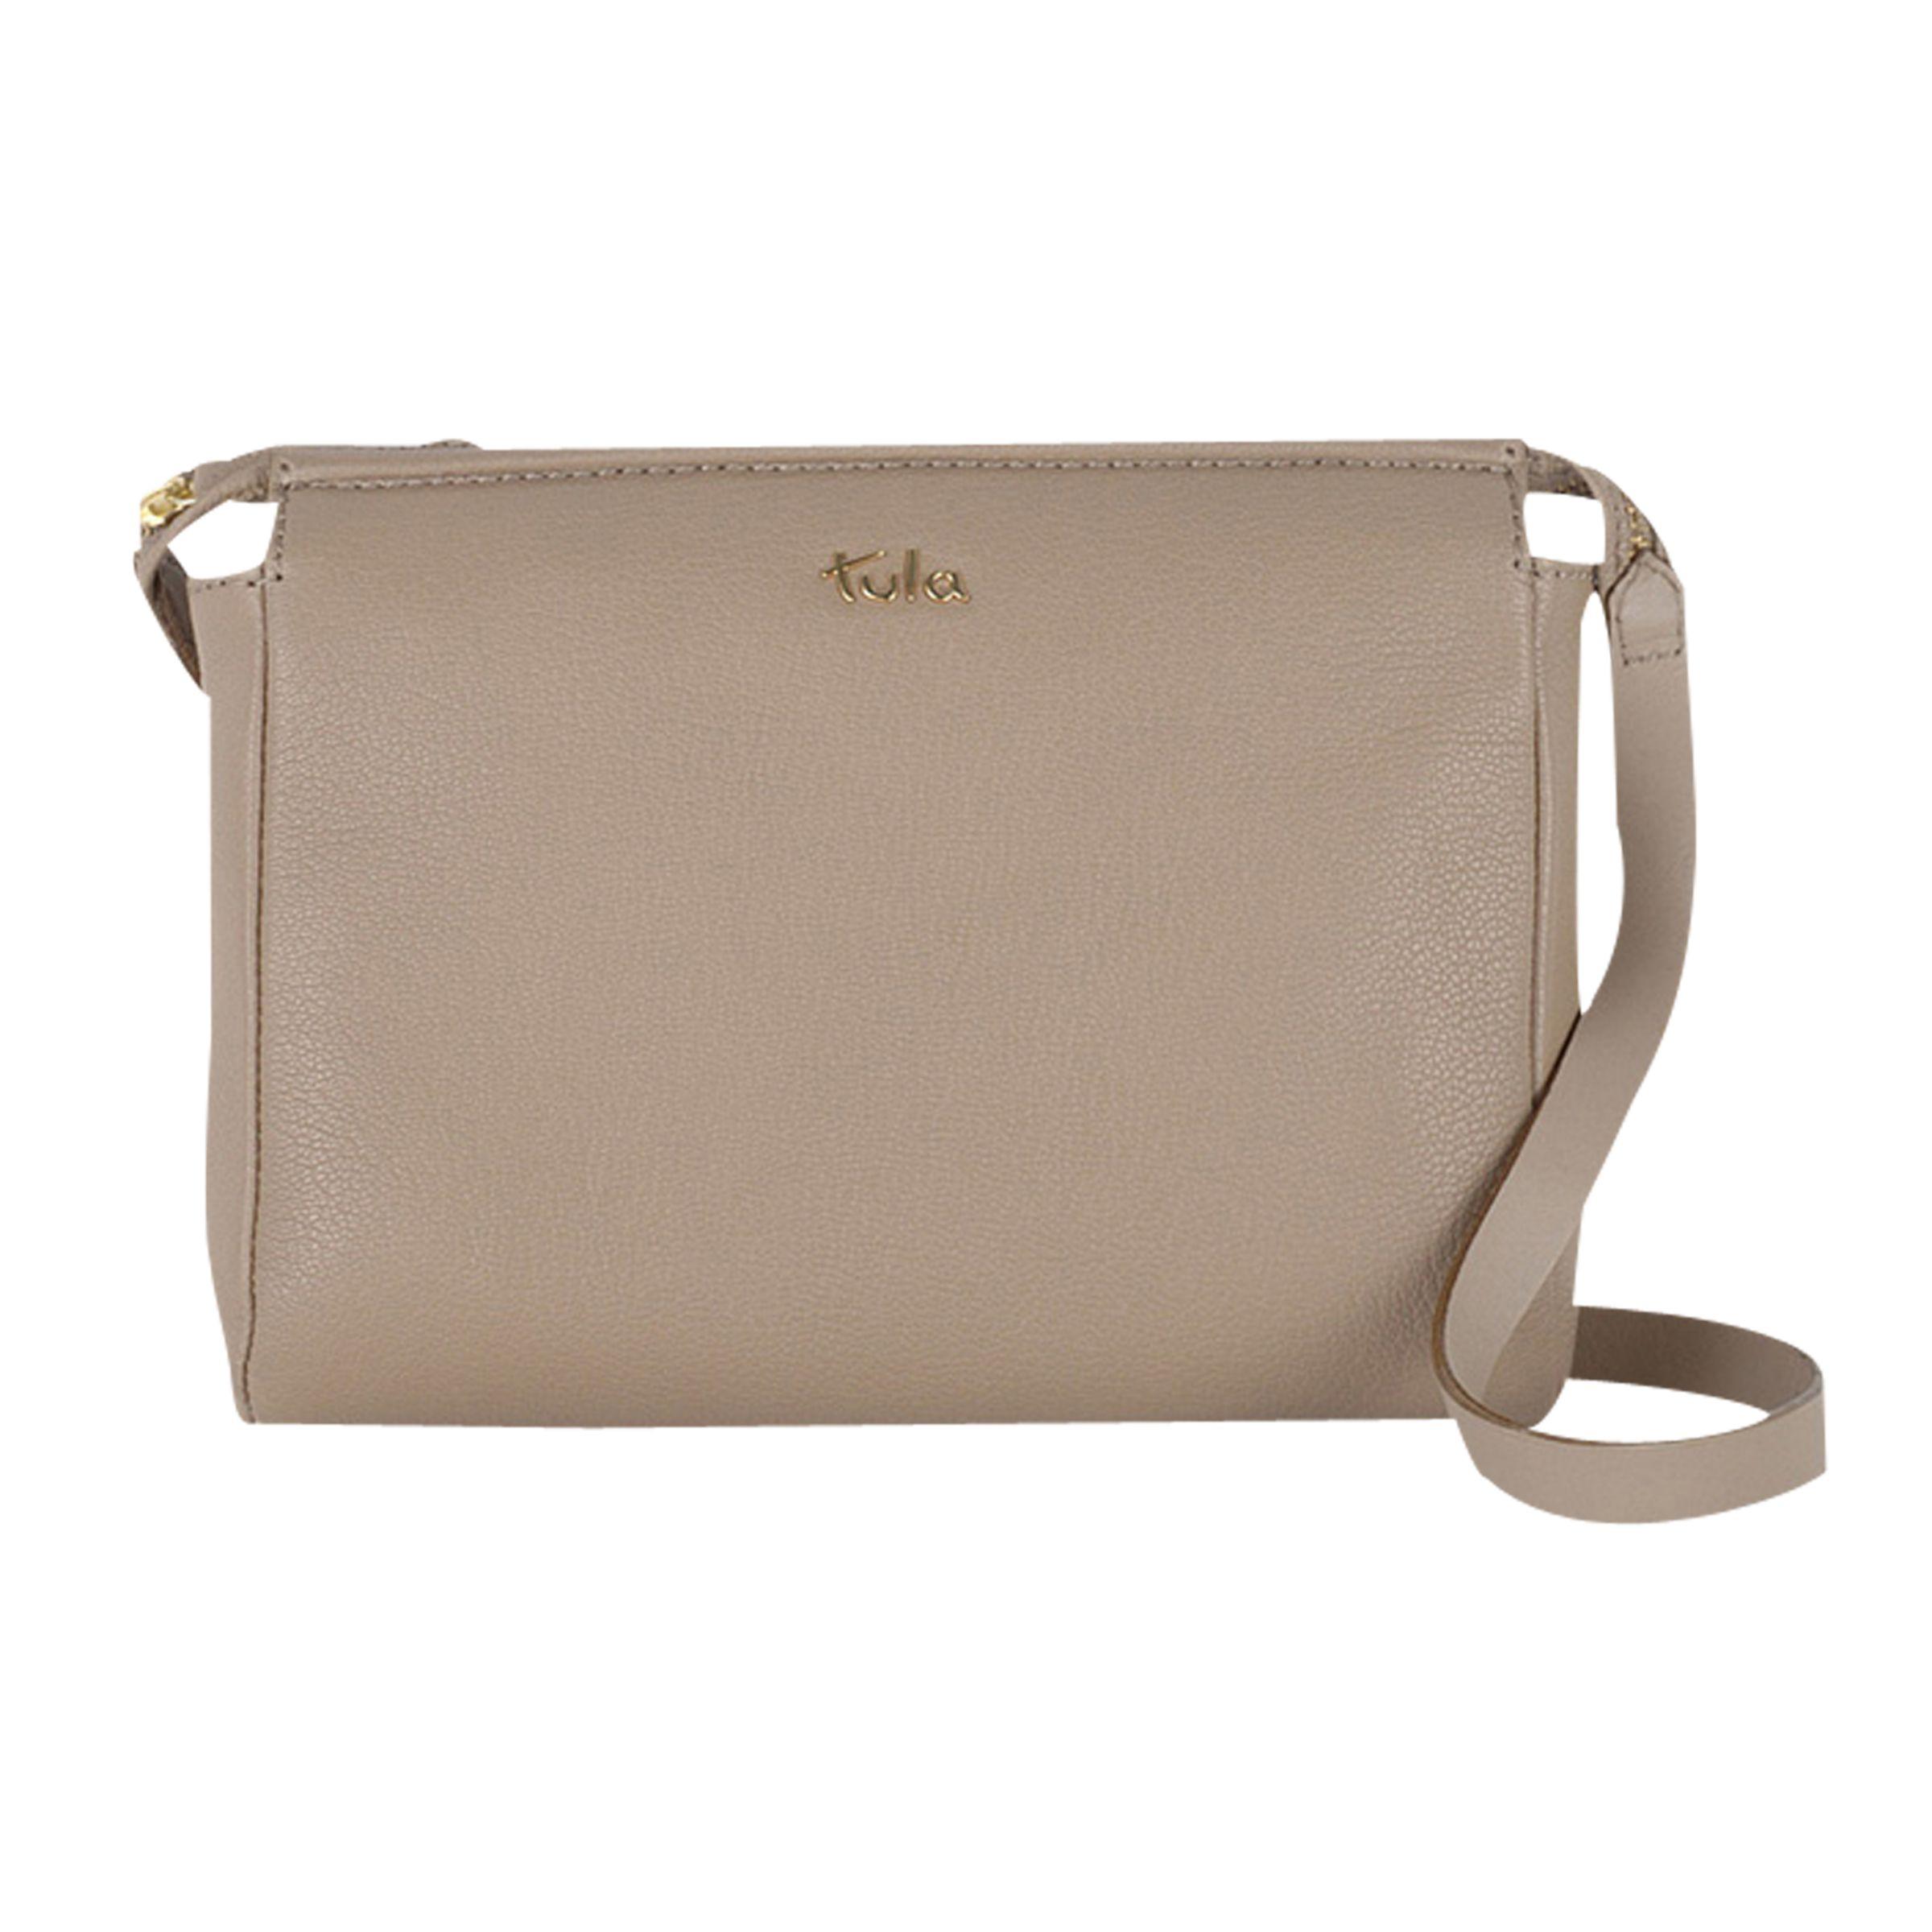 Tula Tula Alpine Originals Leather Small Across Body Bag